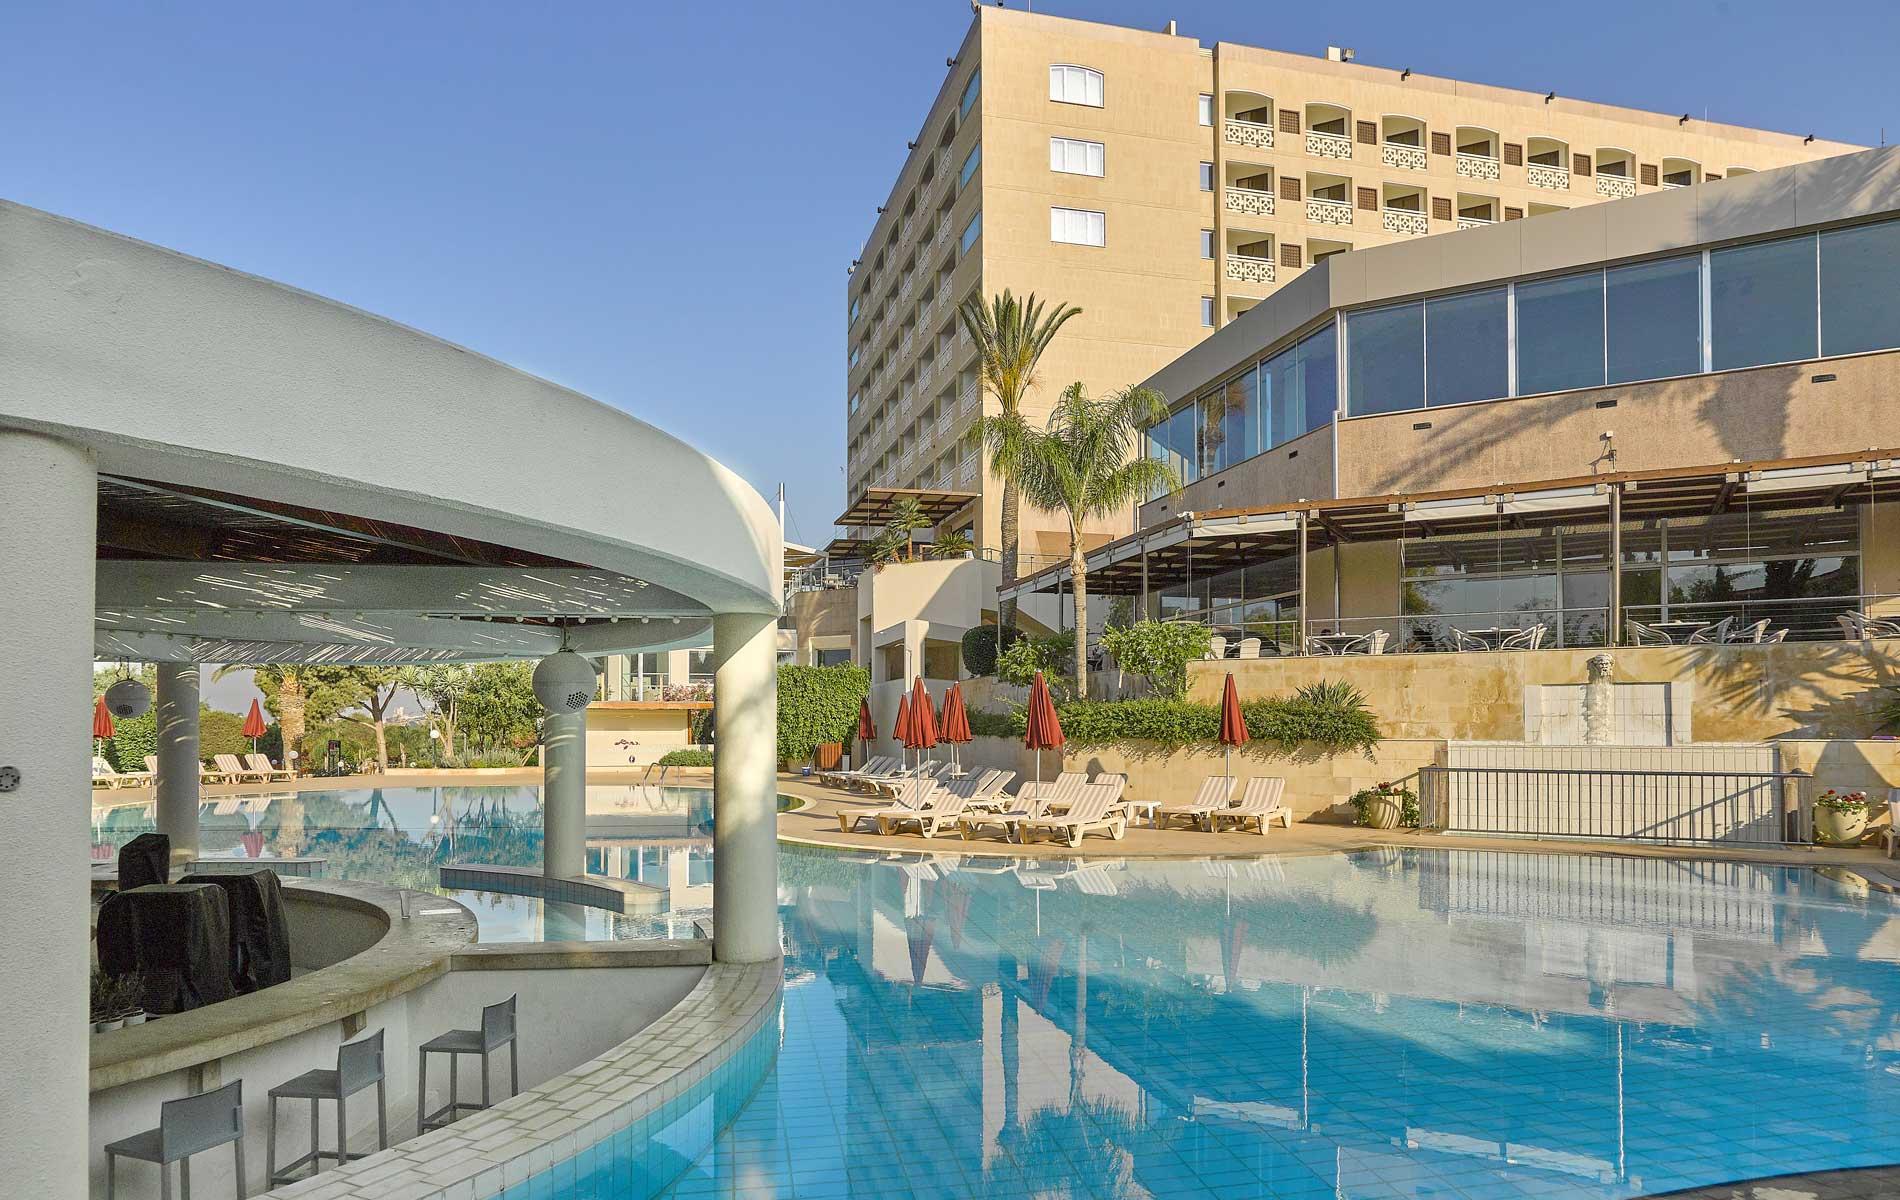 5* St Raphael Resort - Λεμεσός, Κύπρος ✦ 2 Ημέρες (1 Διανυκτέρευση) ✦ 2 άτομα + 1 παιδί έως 10 ετών ✦ Ημιδιατροφή ✦ 01/09/2020 έως 30/09/2020 ✦ Free WiFi!